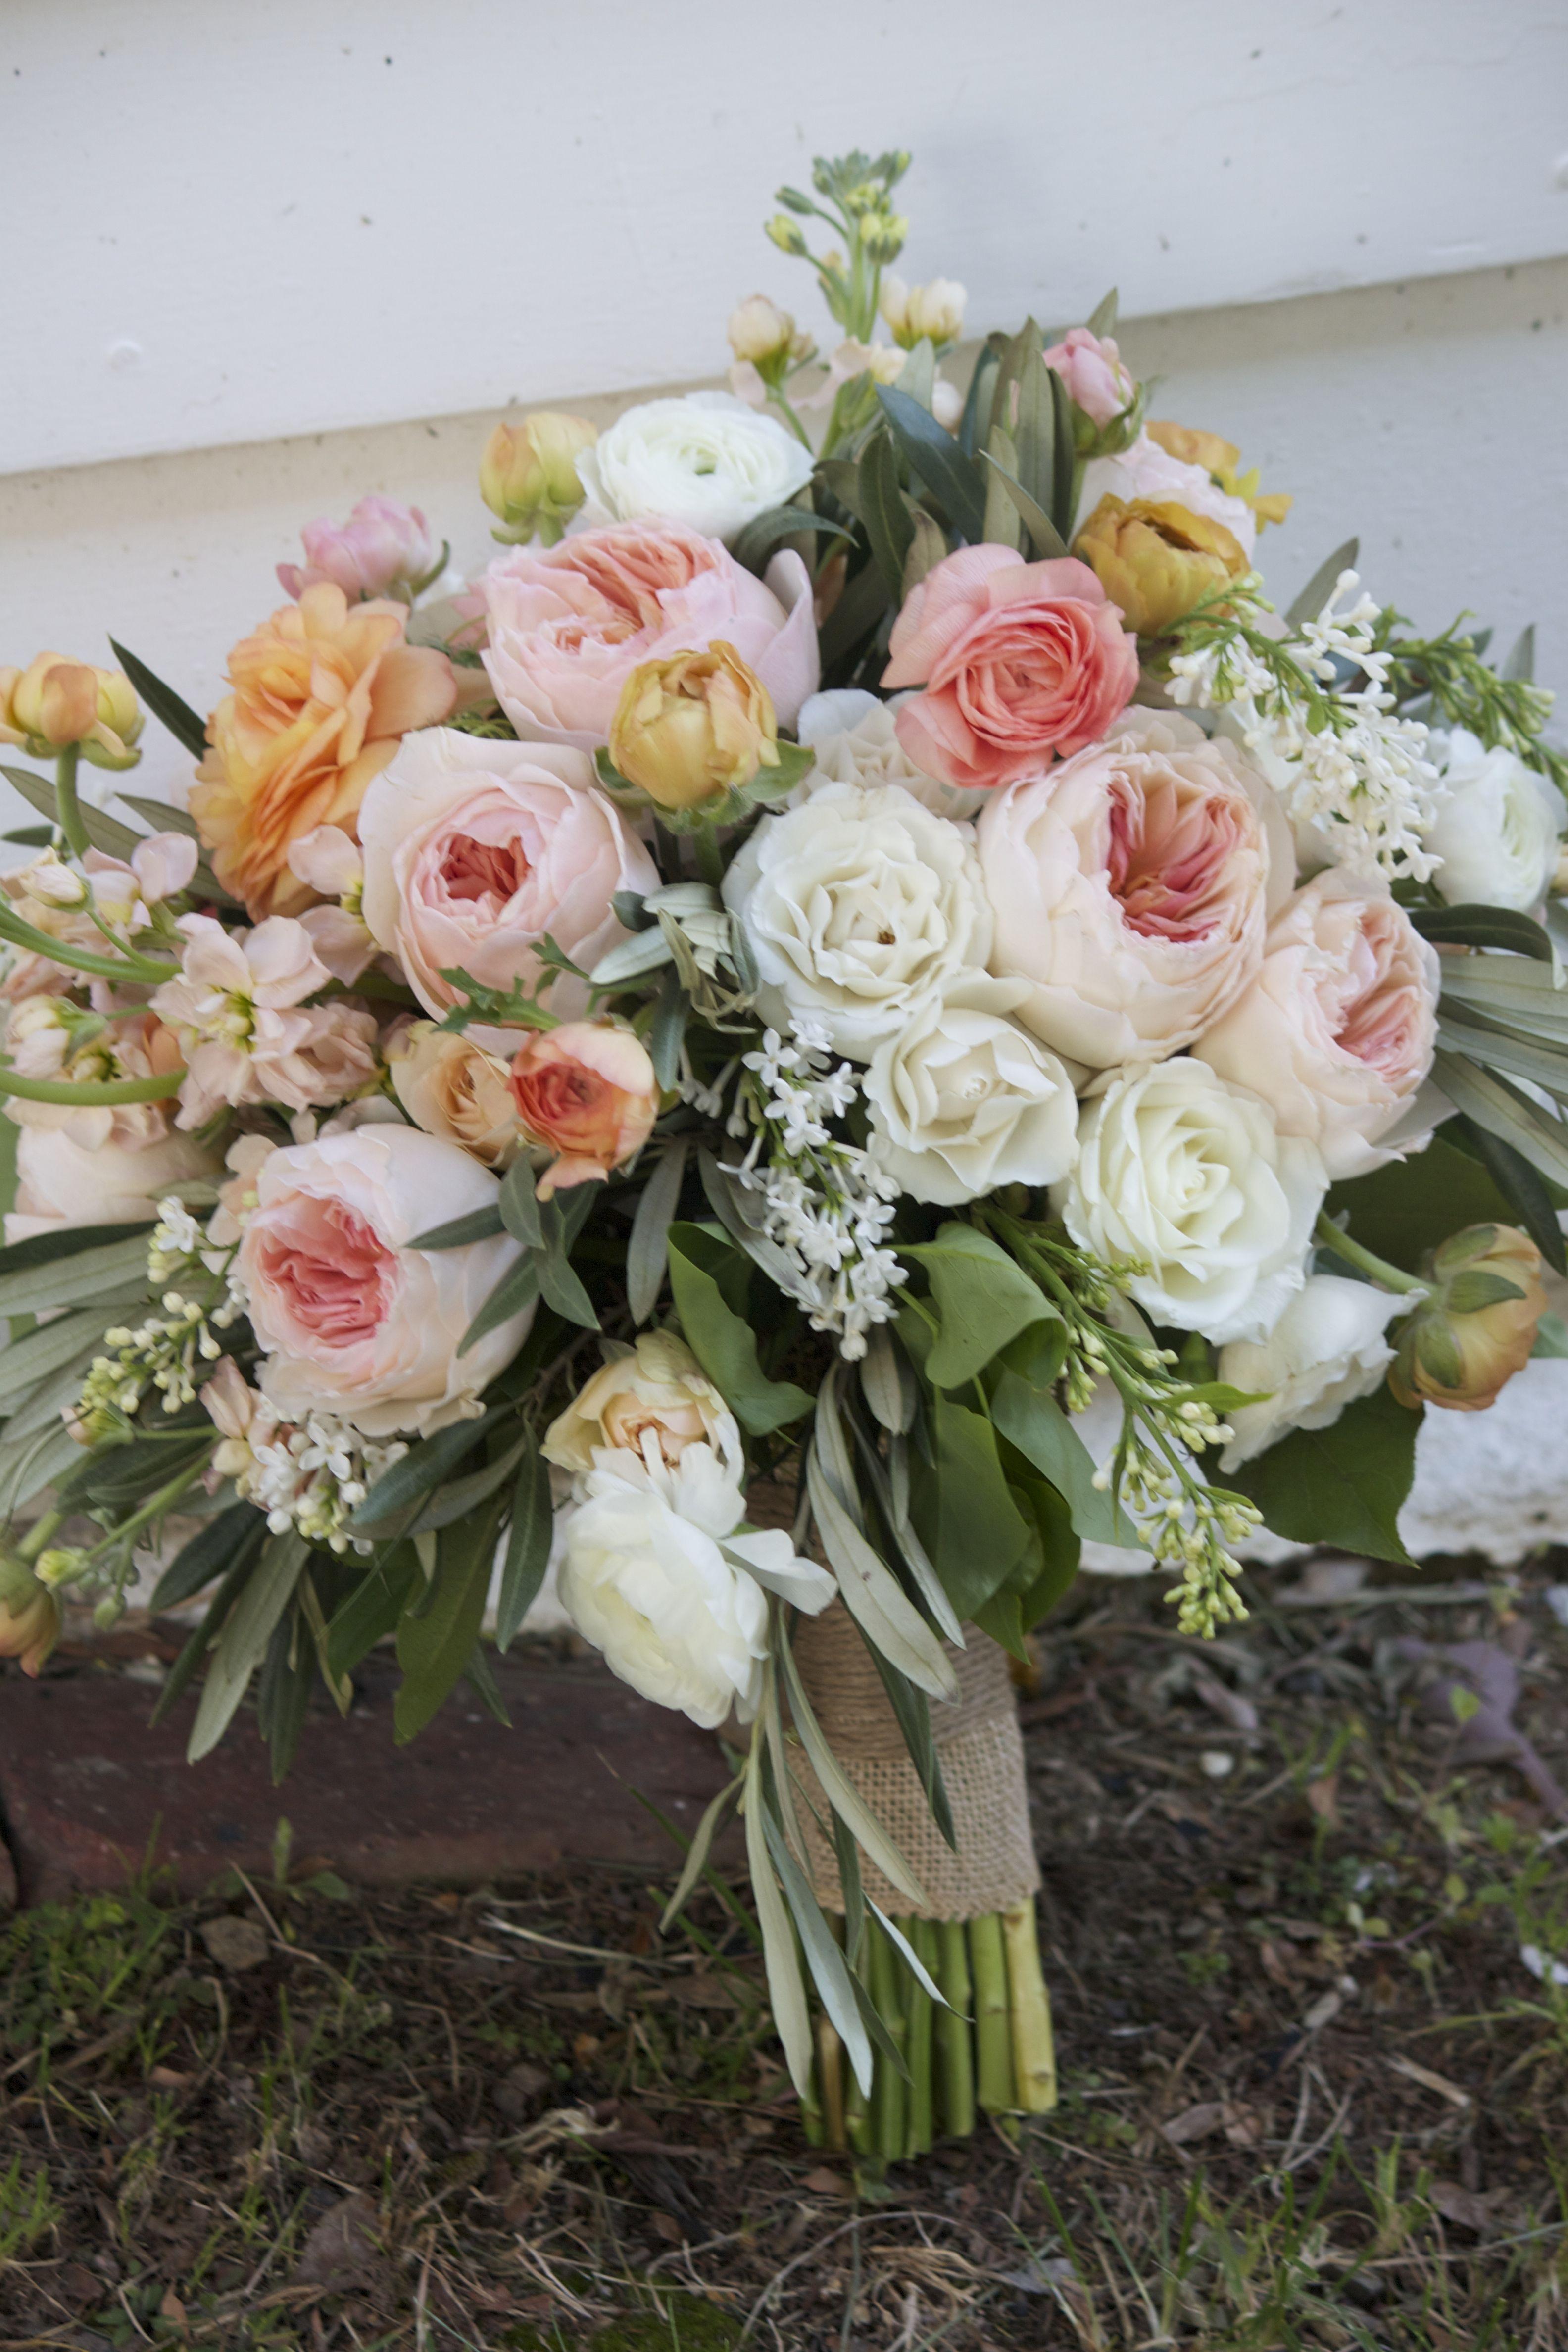 garden rustic bouquet of peach garden roses, white and orange